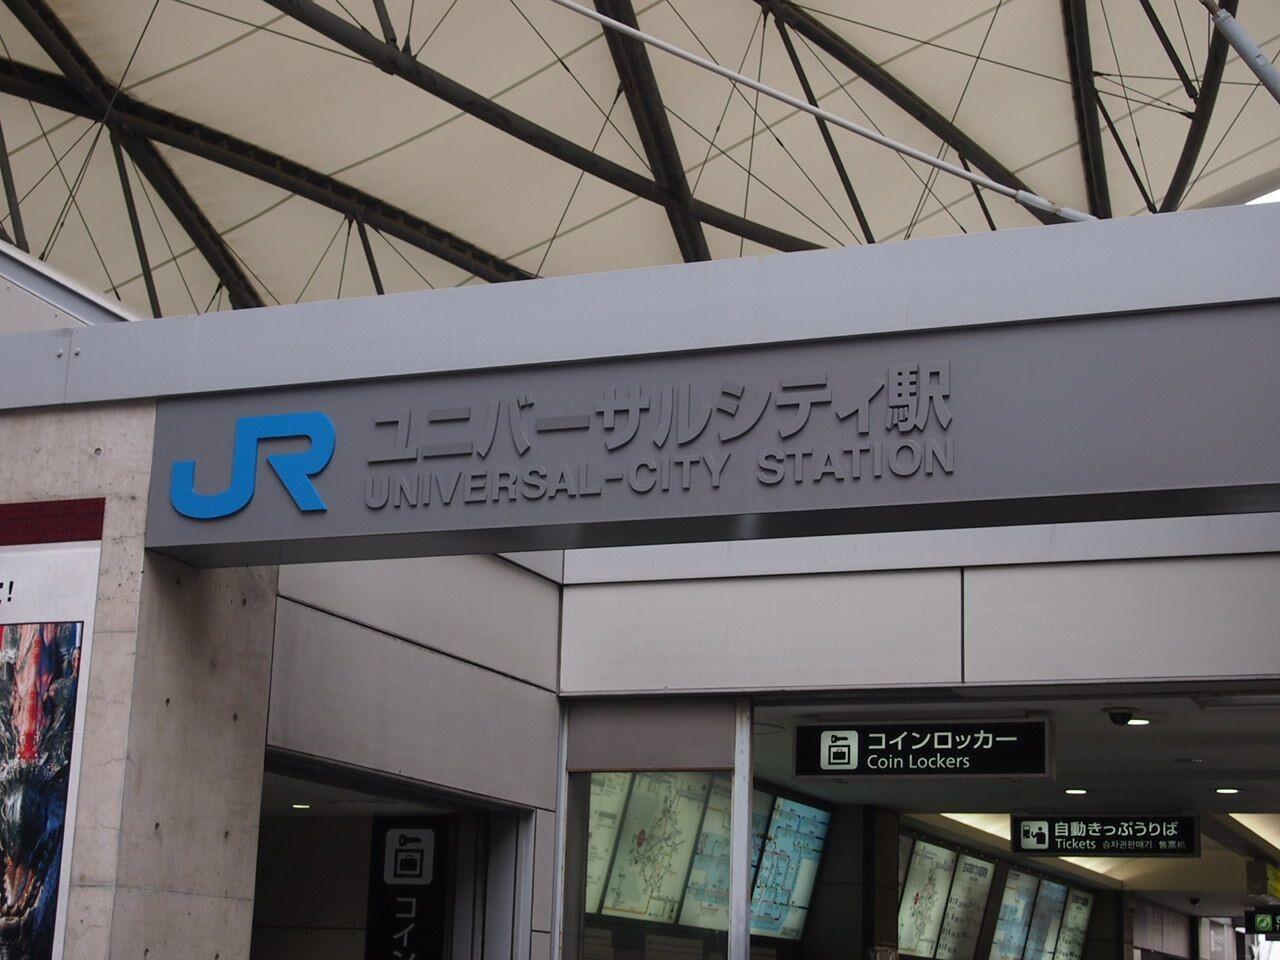 JRユニバーサルシティ駅